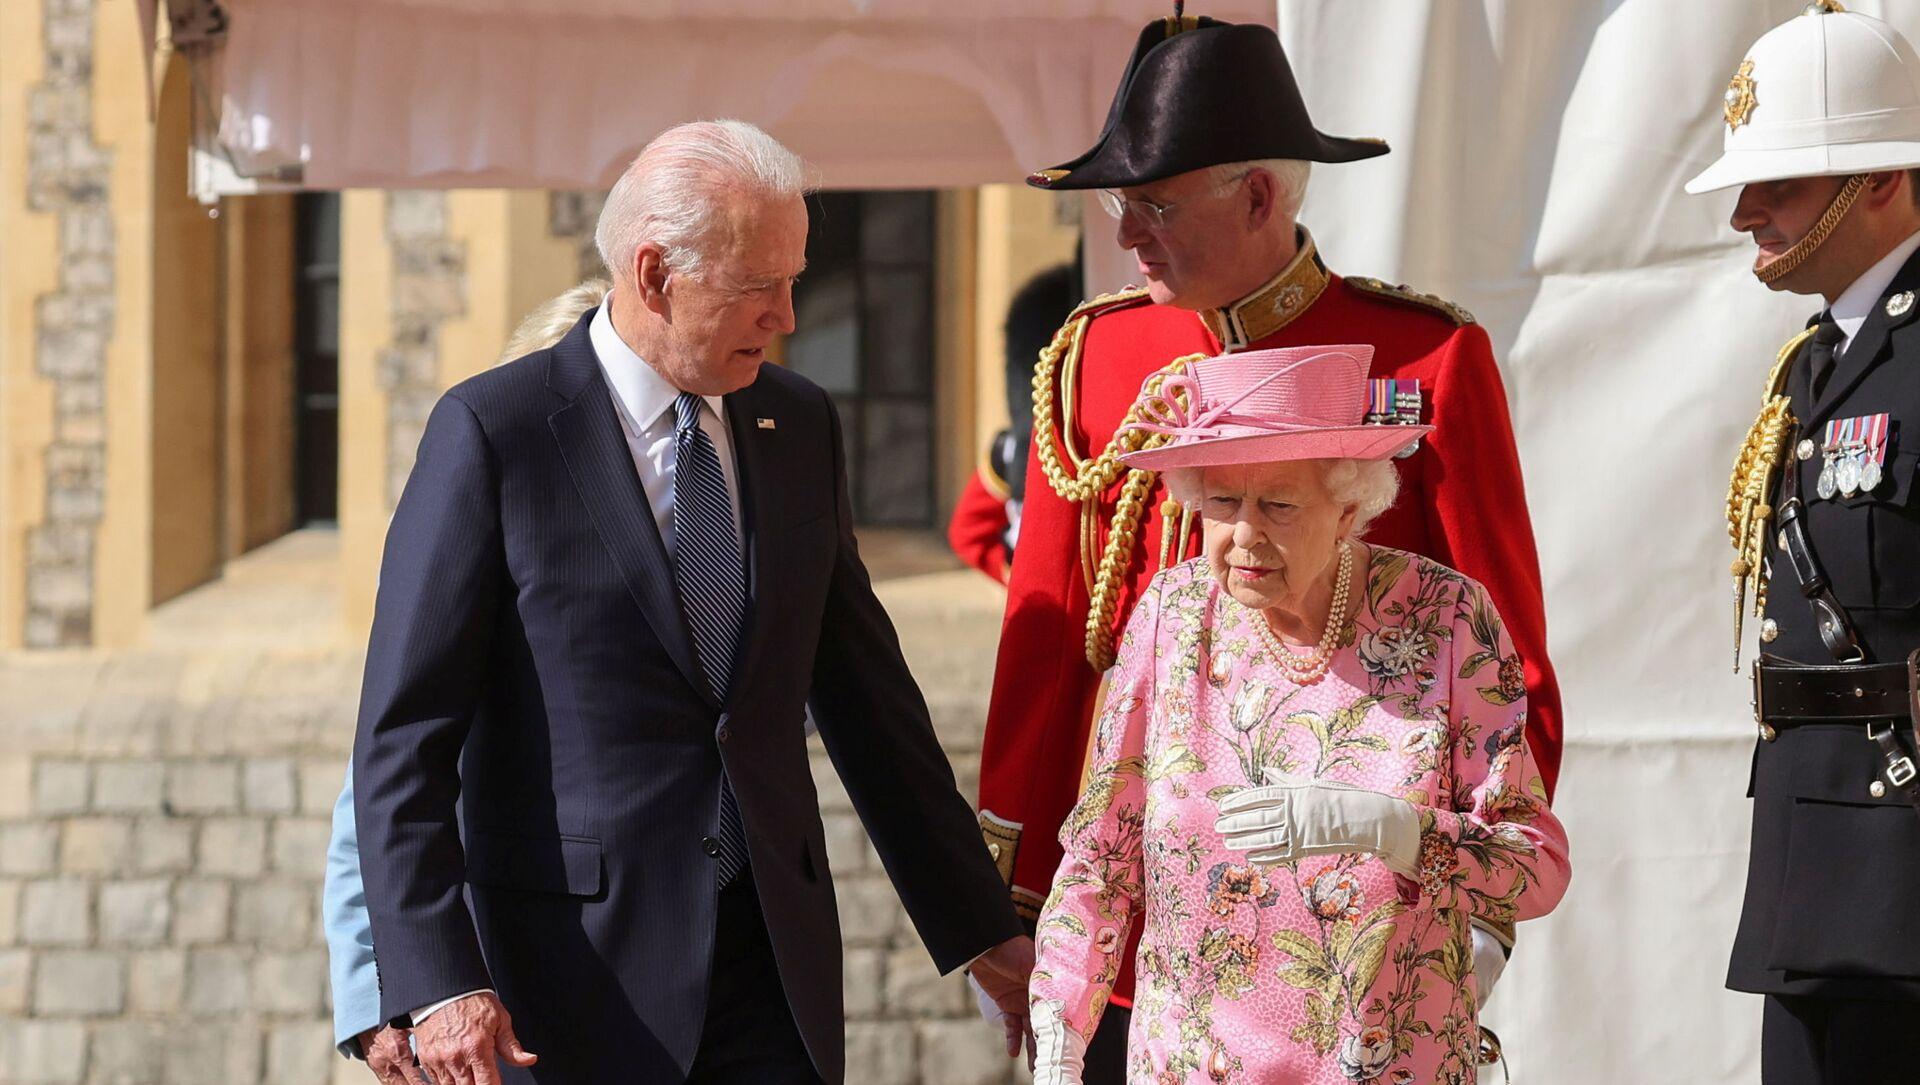 Britain's Queen Elizabeth walks with U.S. President Joe Biden and first lady Jill Biden as they meet at Windsor Castle, in Windsor, Britain, June 13, 2021. - Sputnik International, 1920, 13.06.2021